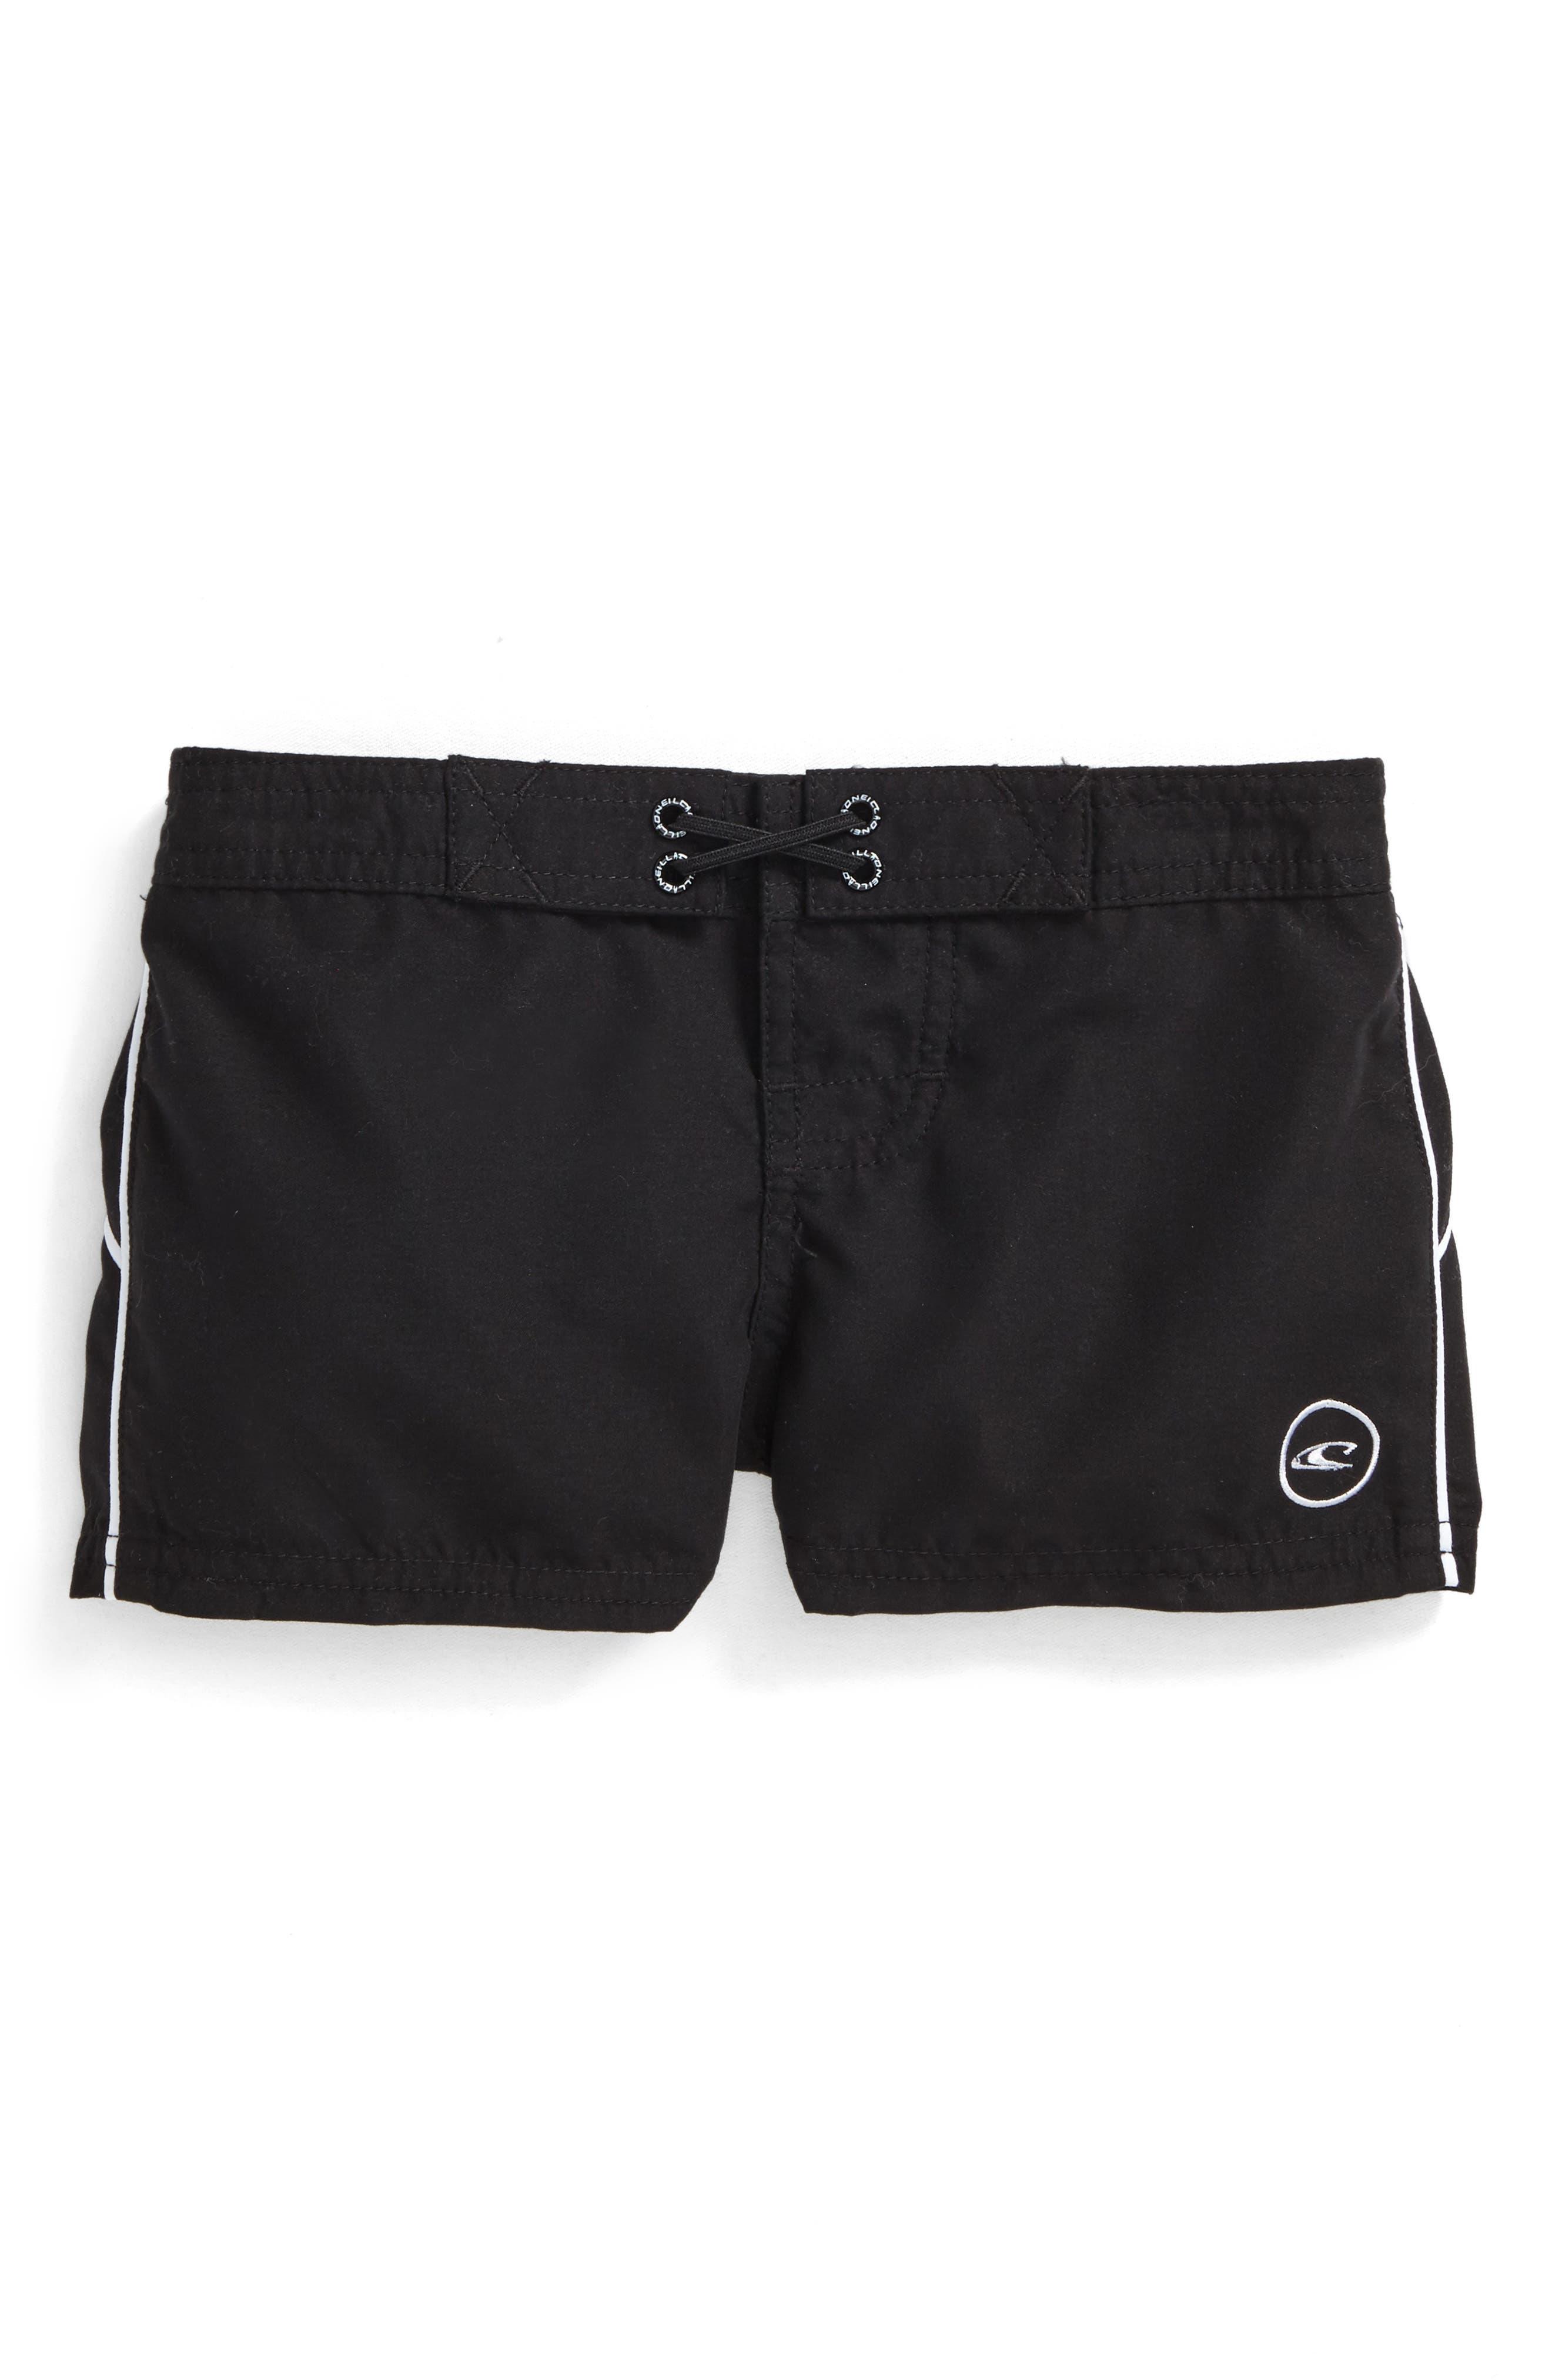 Salt Water Board Shorts,                             Alternate thumbnail 2, color,                             Black - Blk